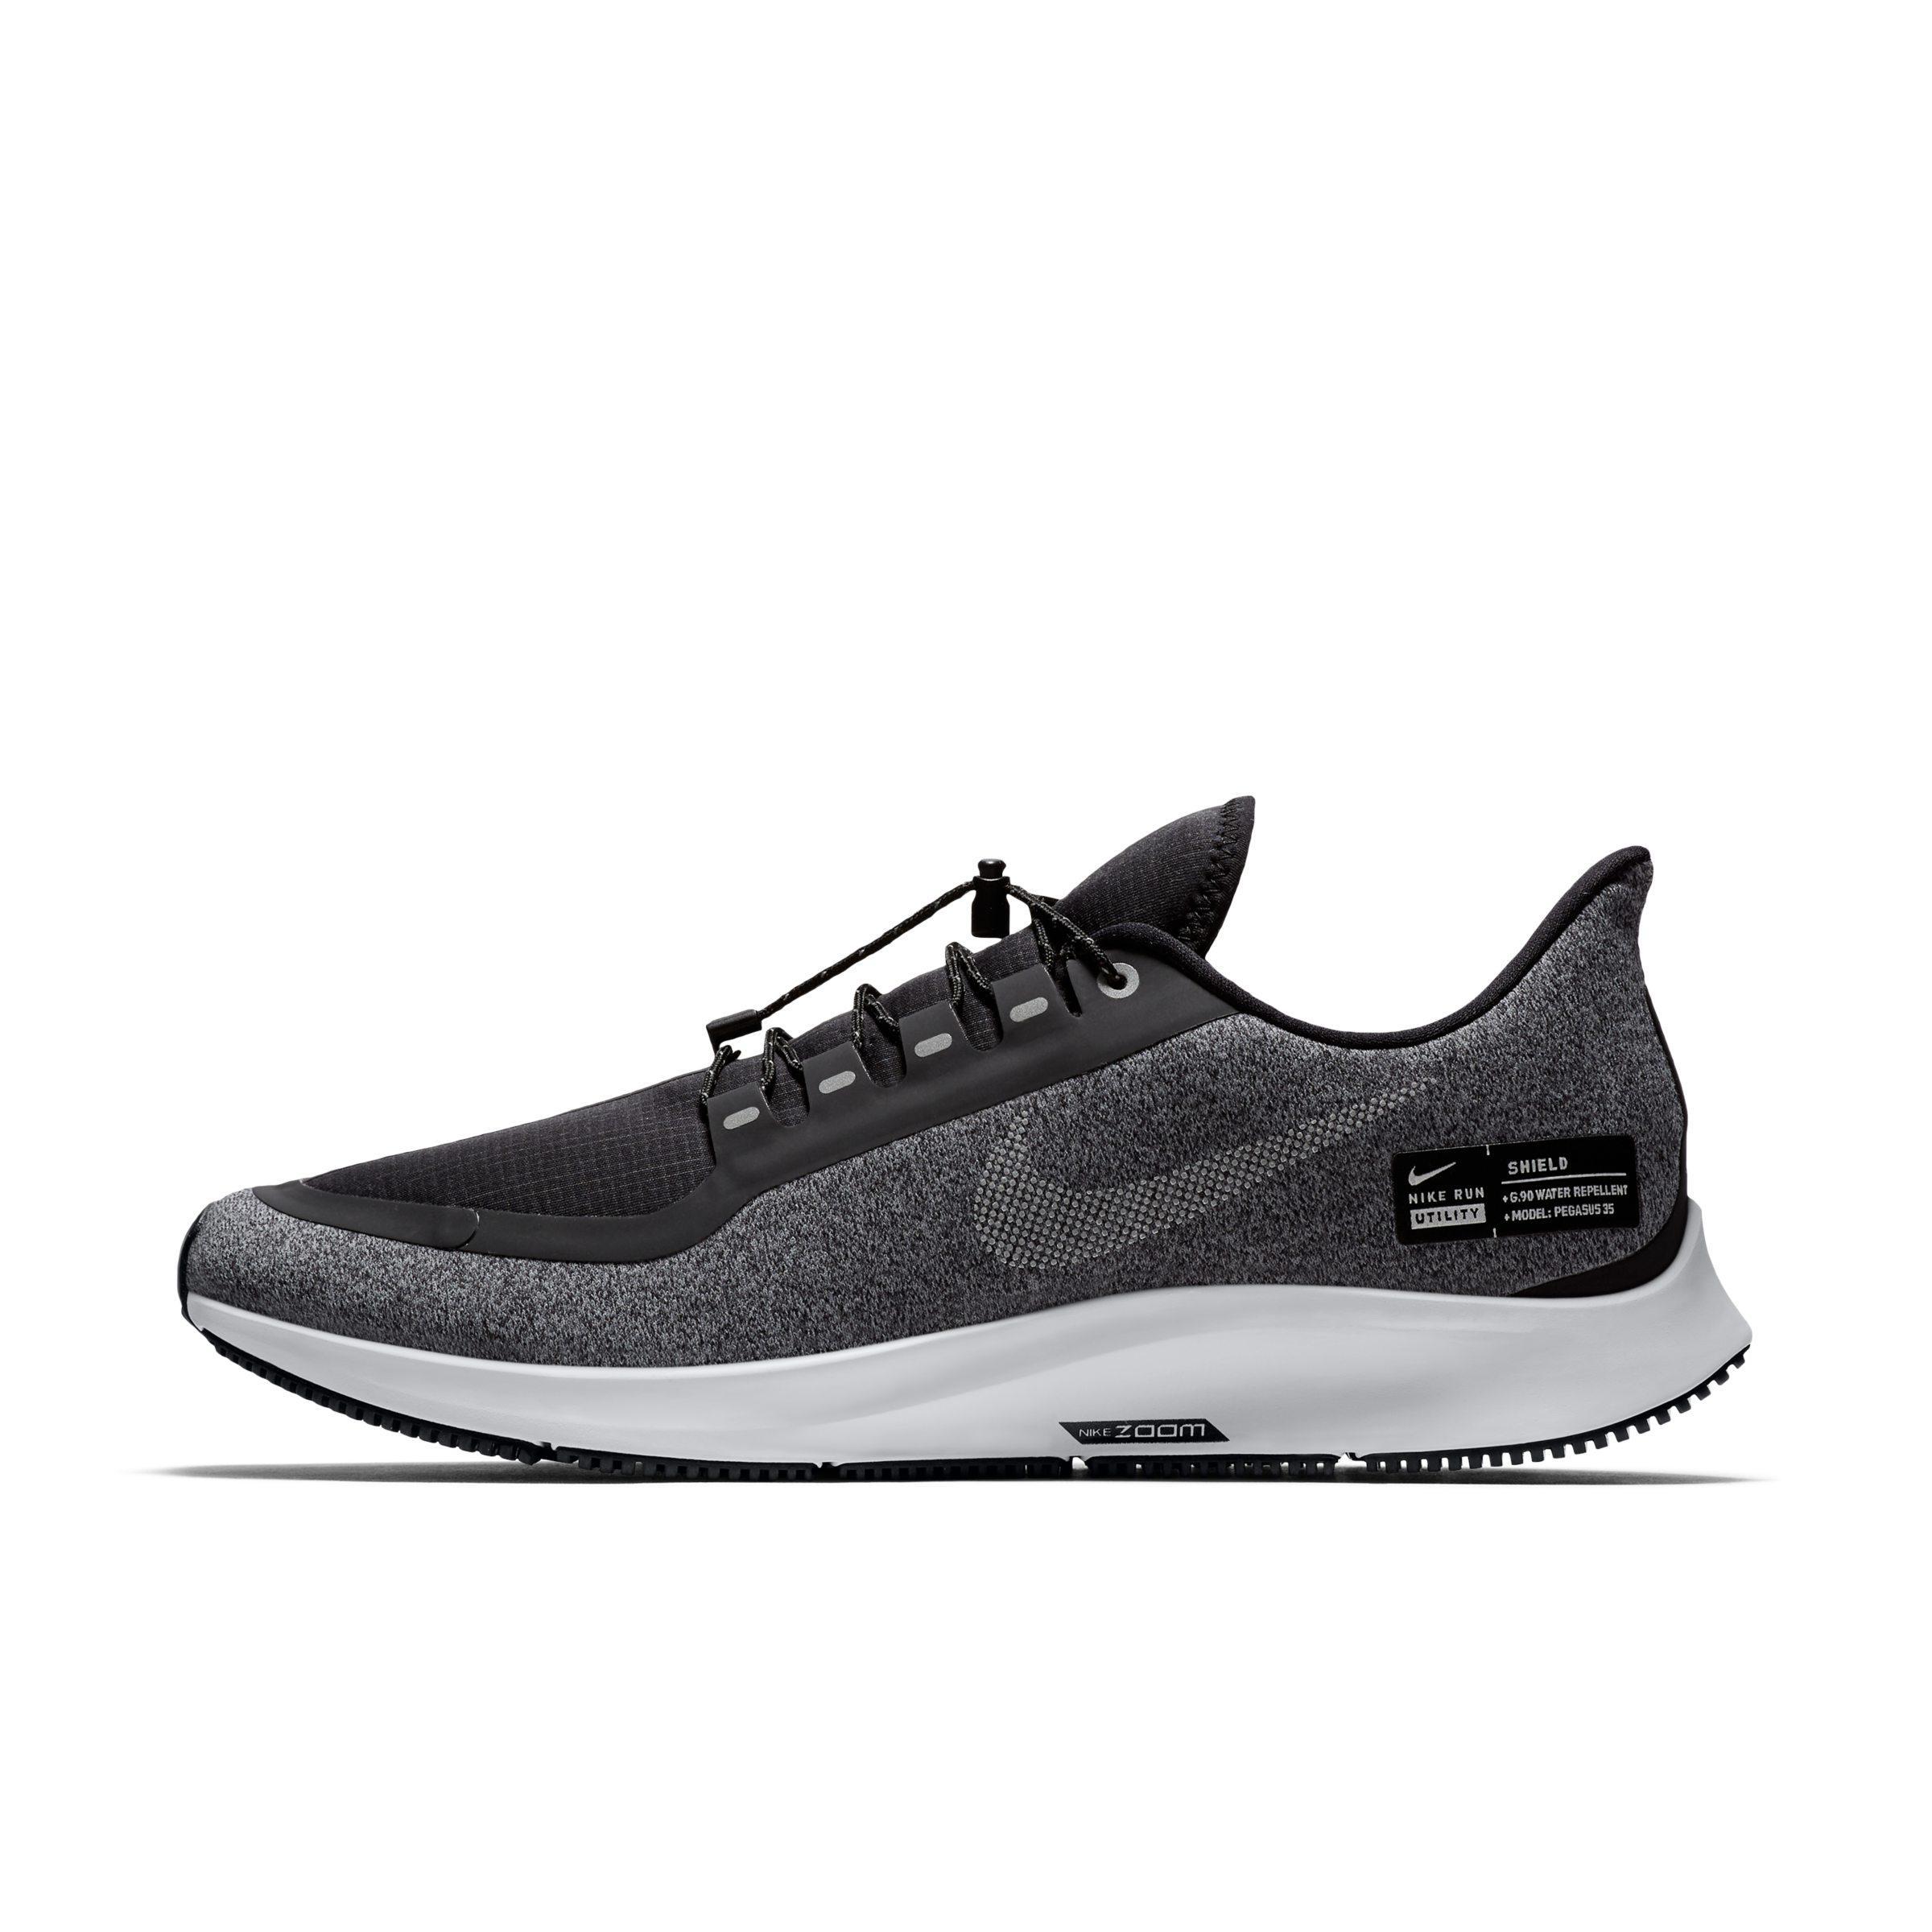 4a0dc209b0b59 Nike Air Zoom Pegasus 35 Shield Running Shoe in Black for Men - Lyst